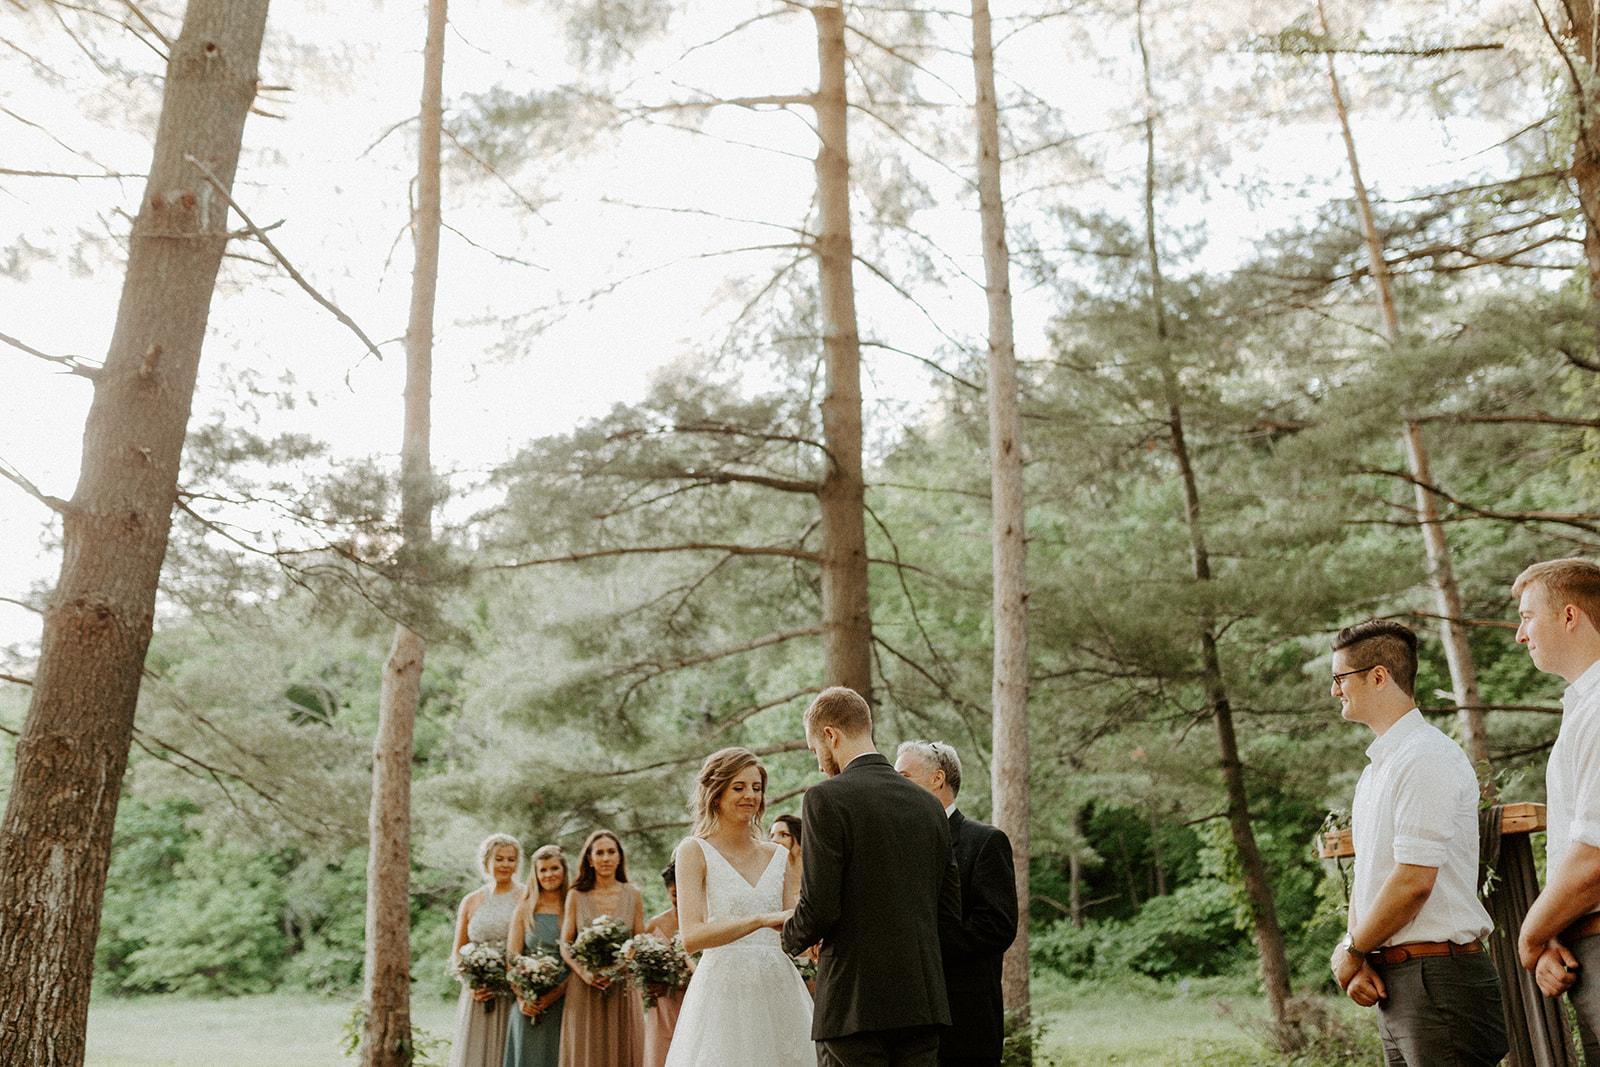 camp_wokanda_peoria_illinois_wedding_photographer_wright_photographs_bliese_0224.jpg